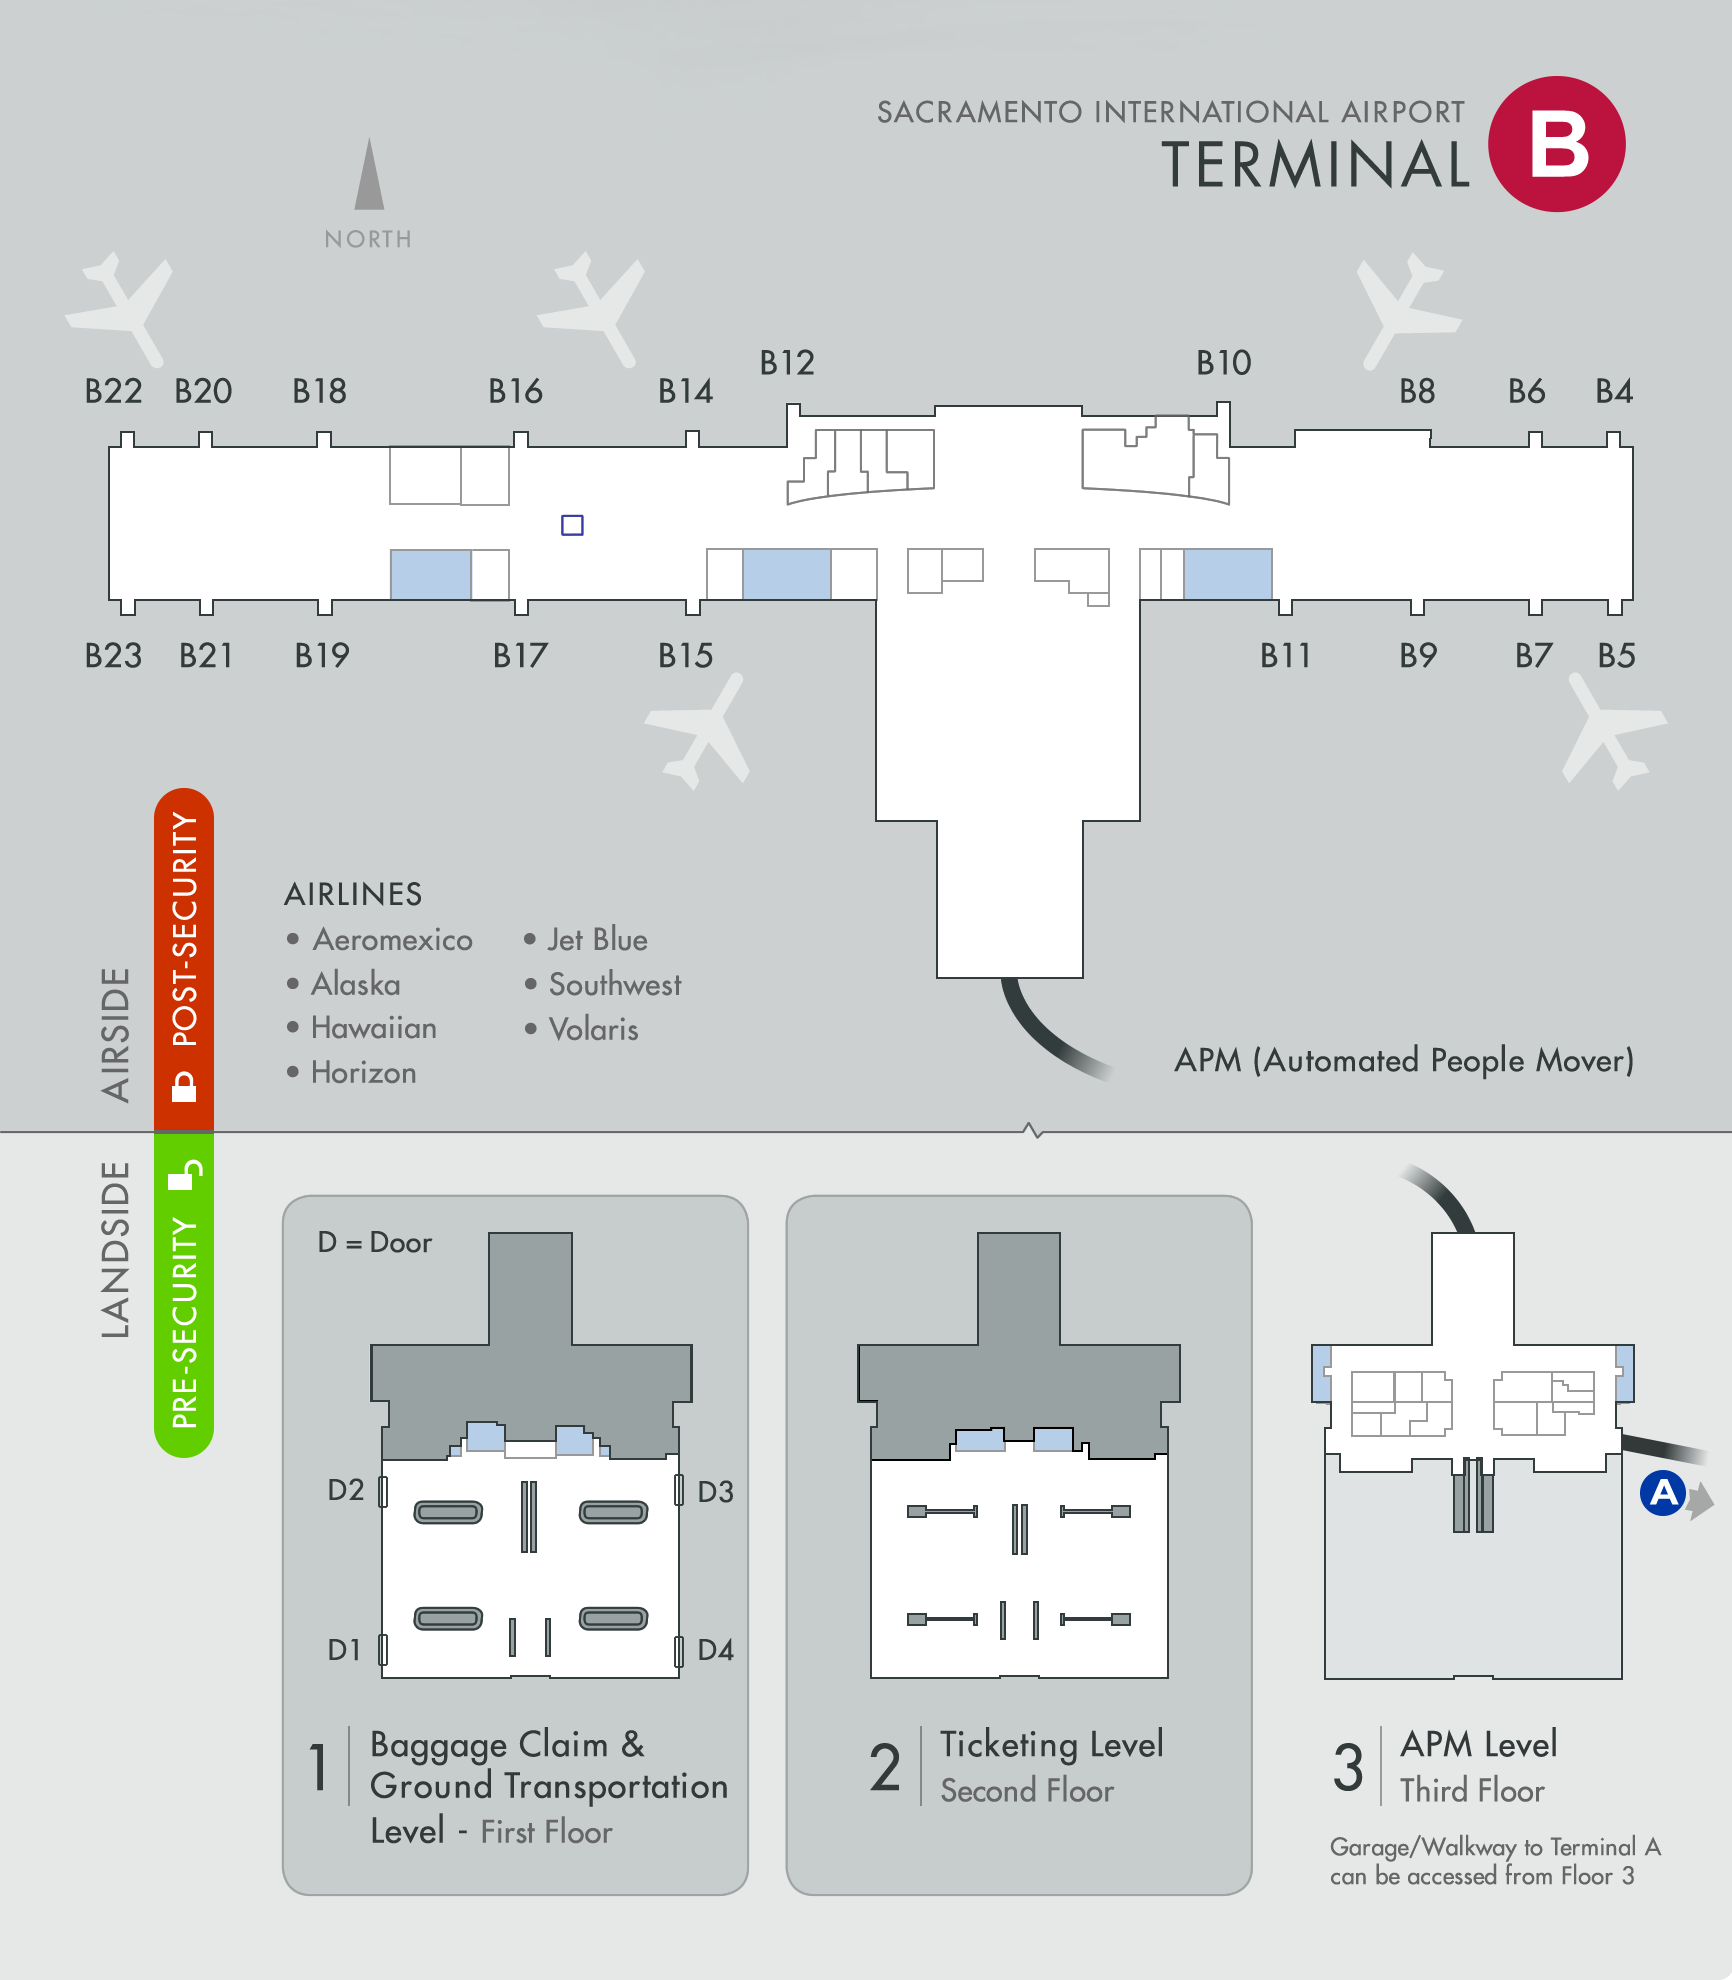 Sac International Airport Car Rental